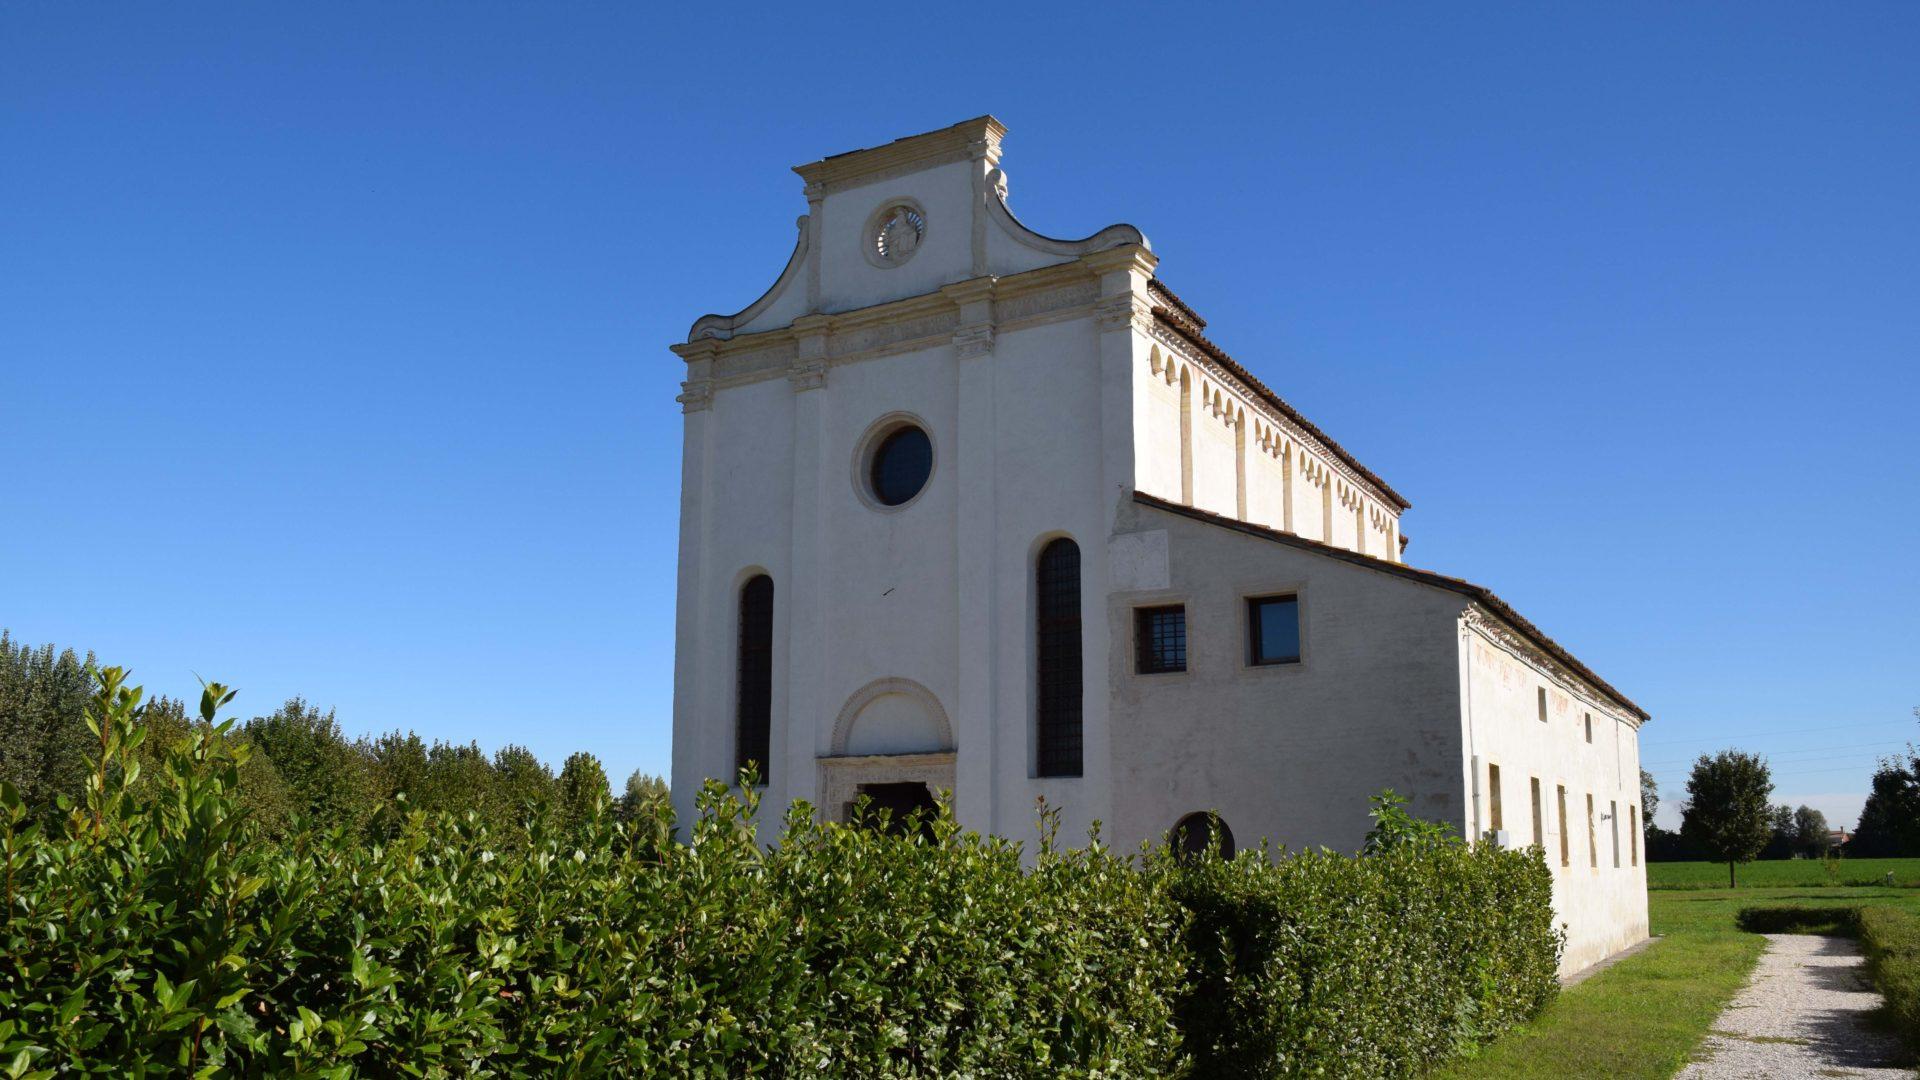 POI 190 Chiesetta di Sant'anna